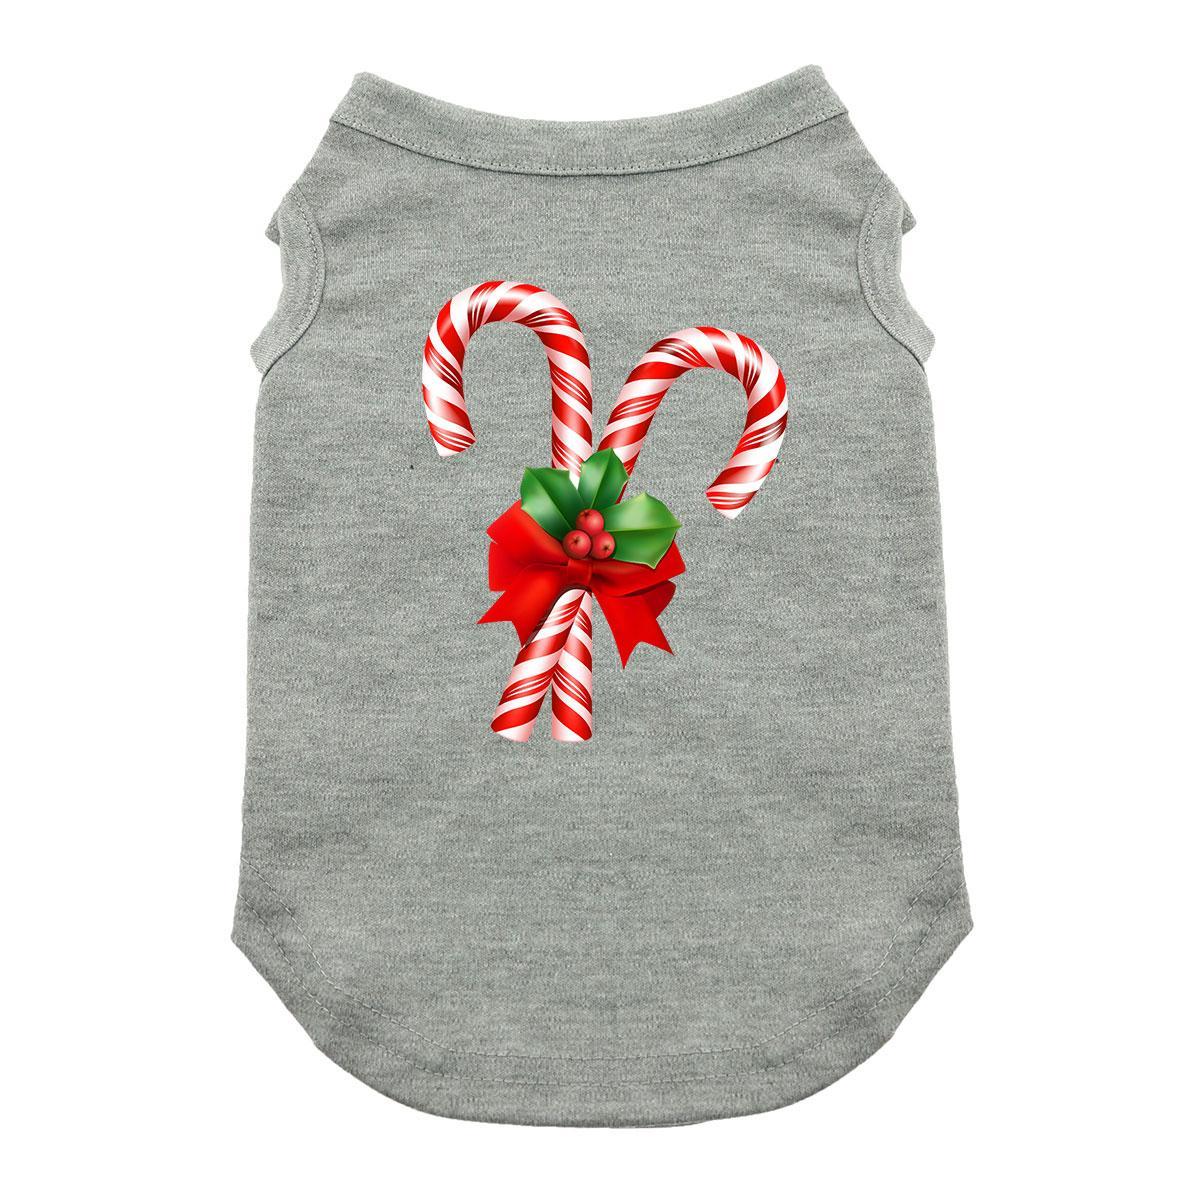 Candy Cane Holiday Dog Shirt - Gray